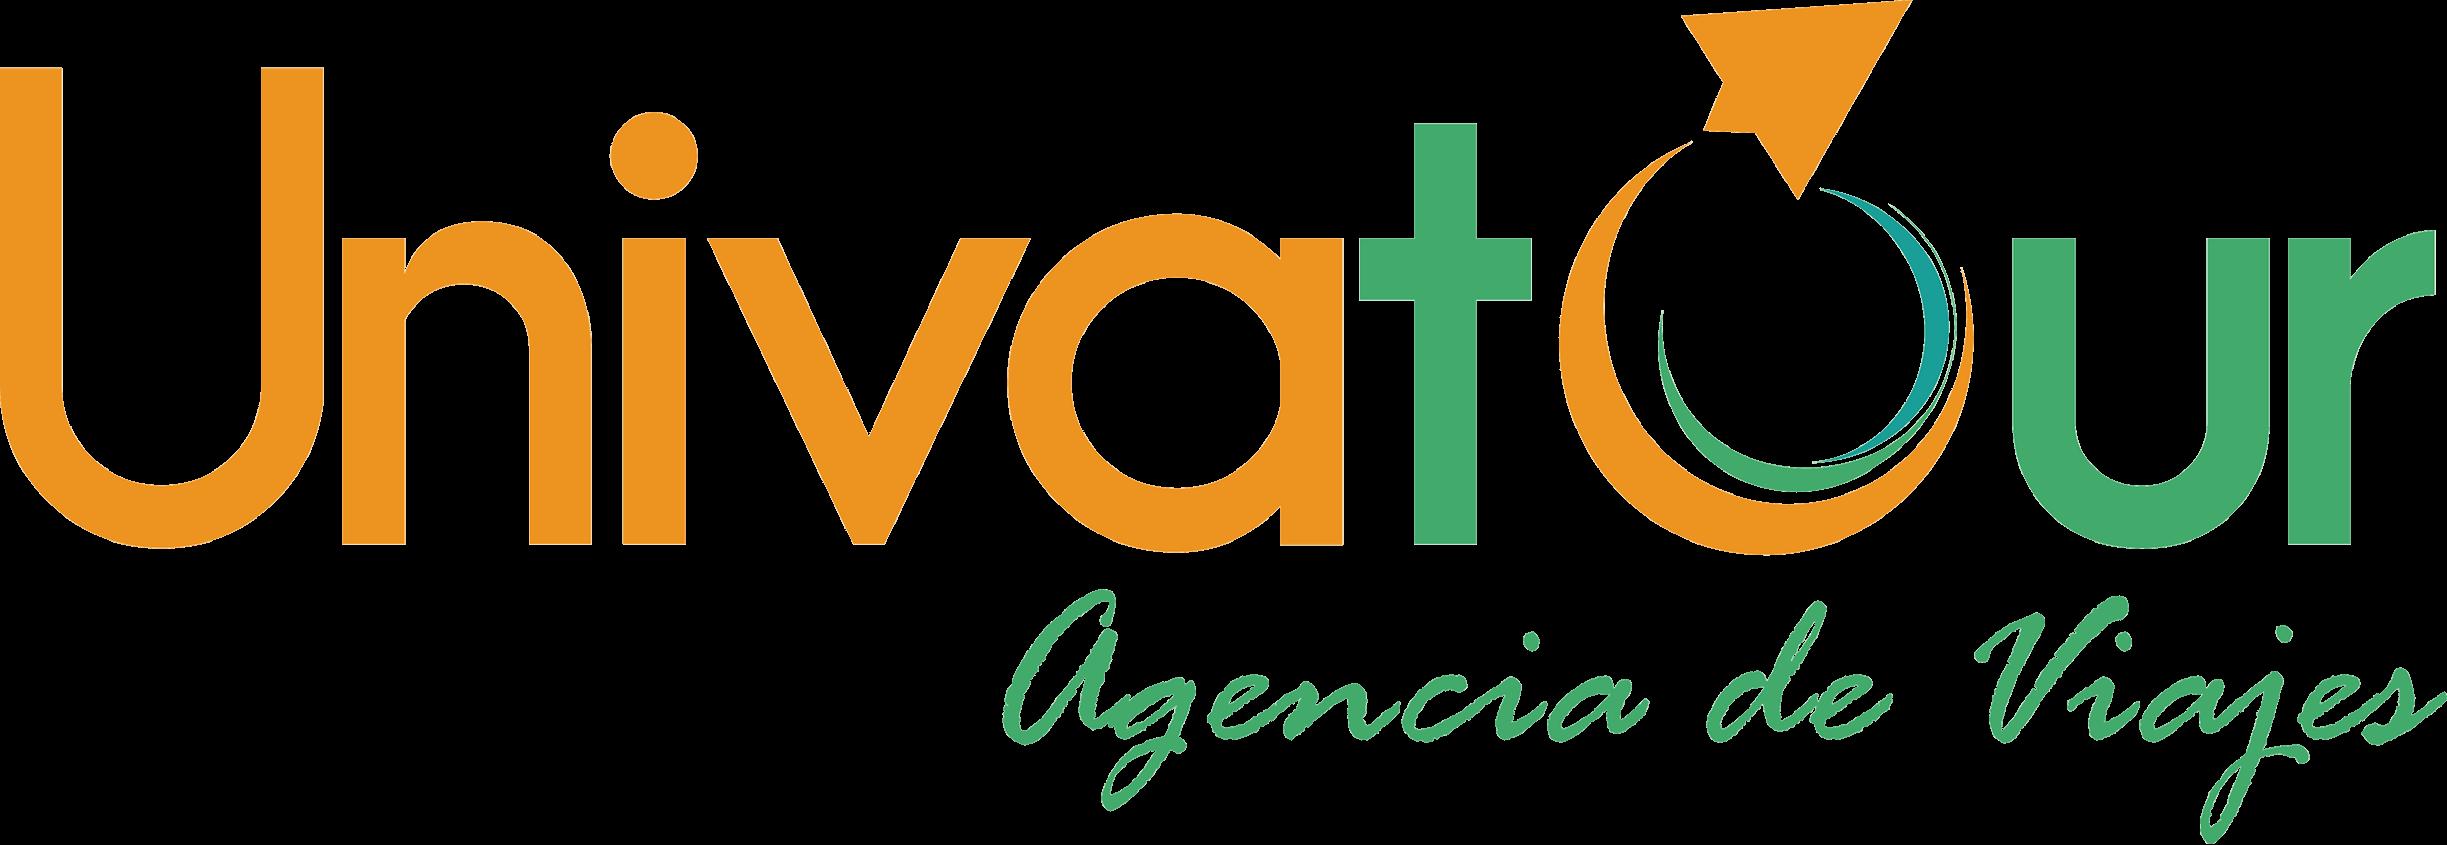 univatour-logo